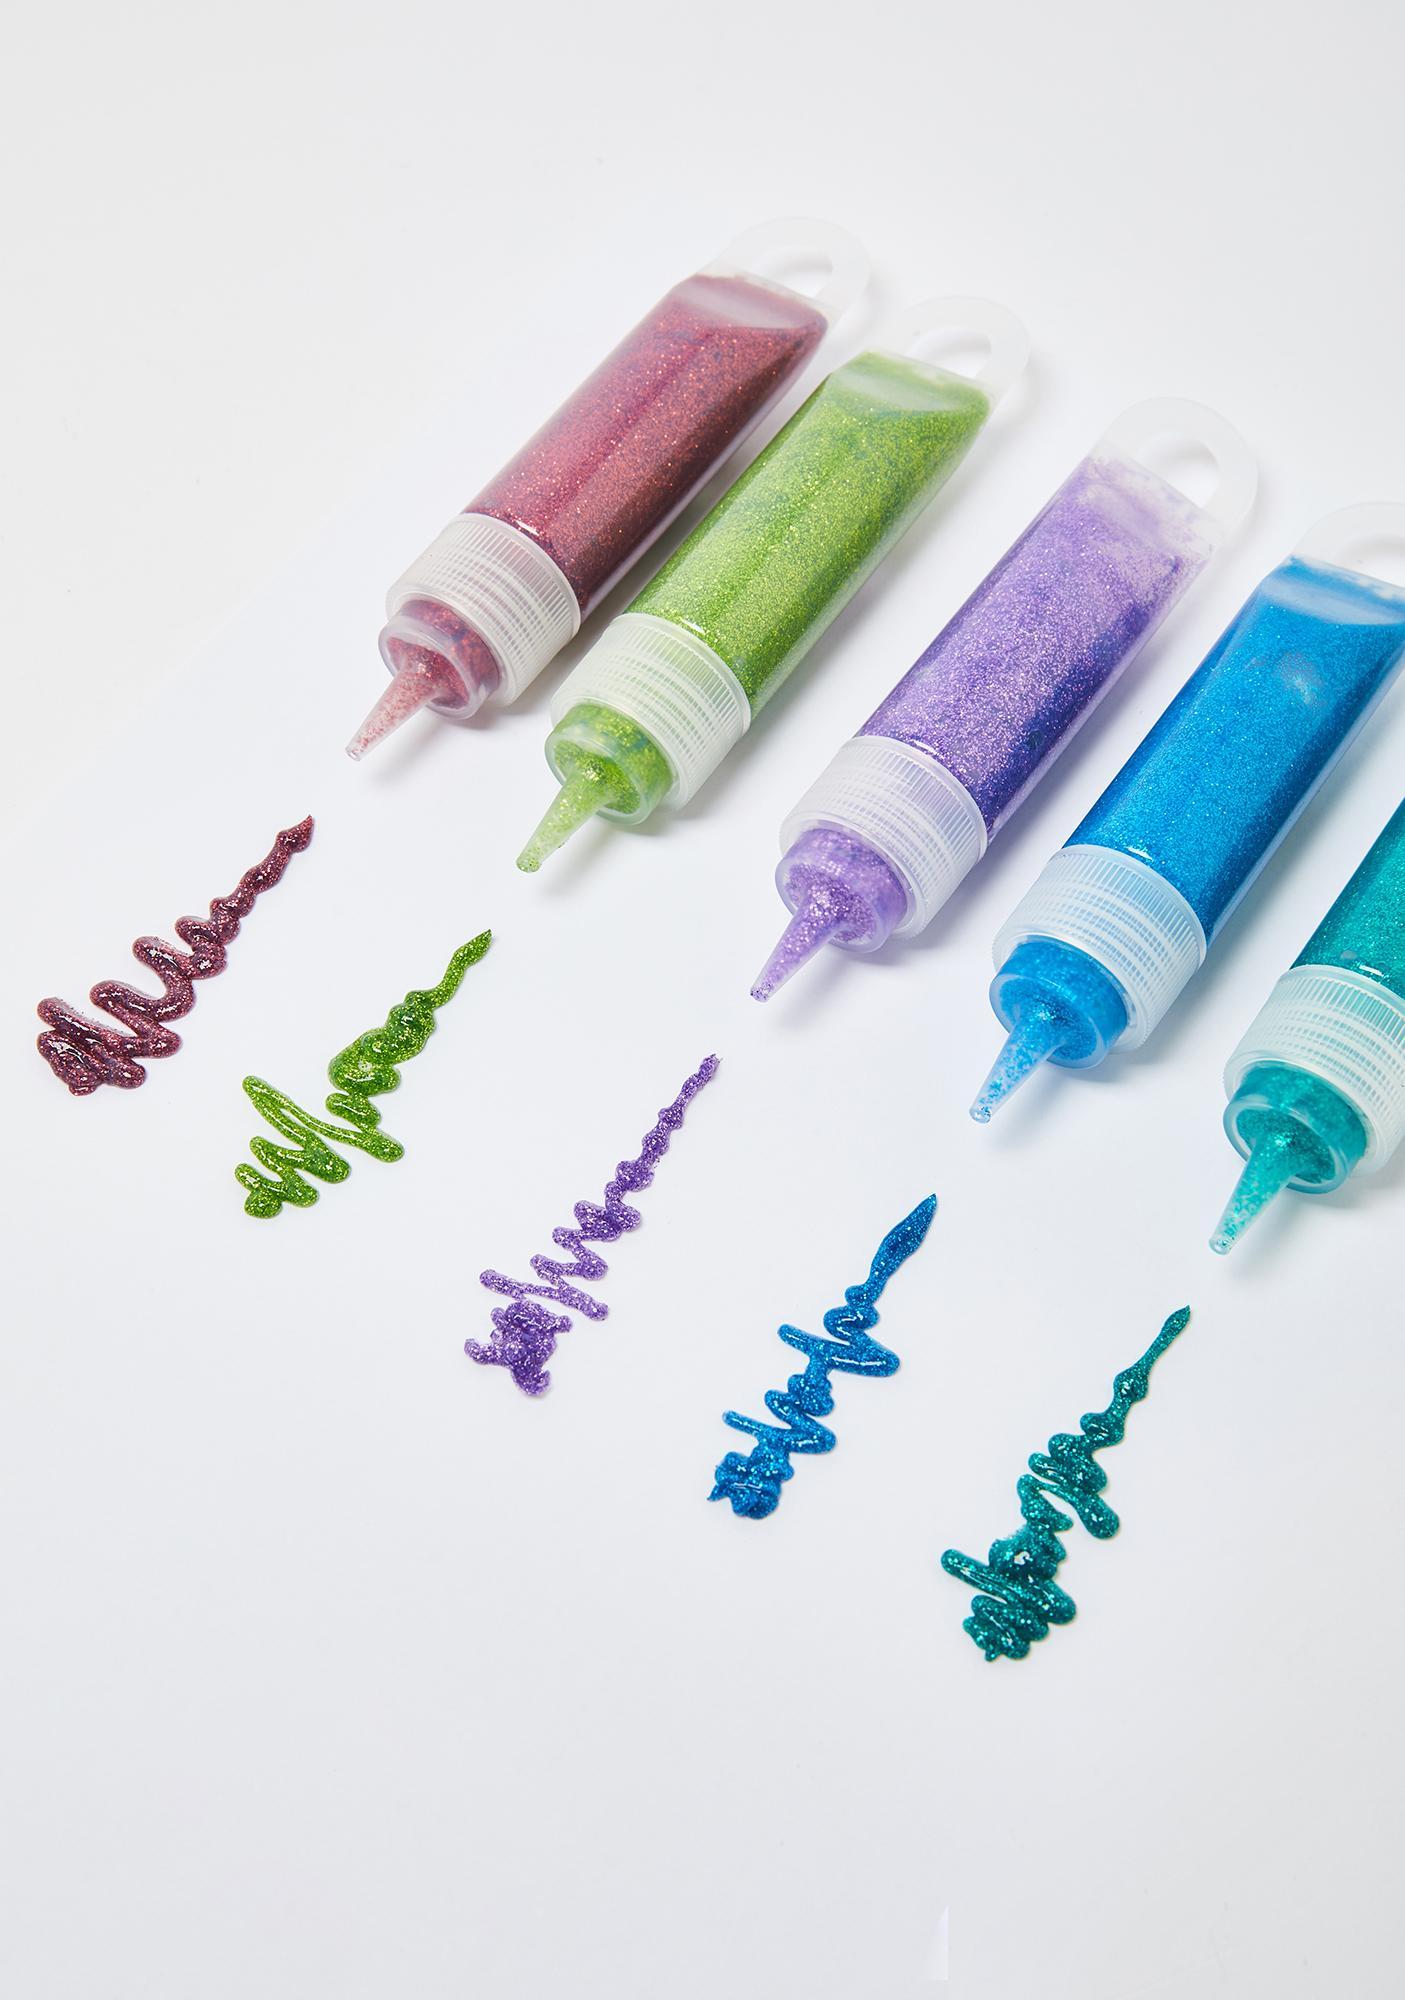 Always Shining Glitter Fabric Paint